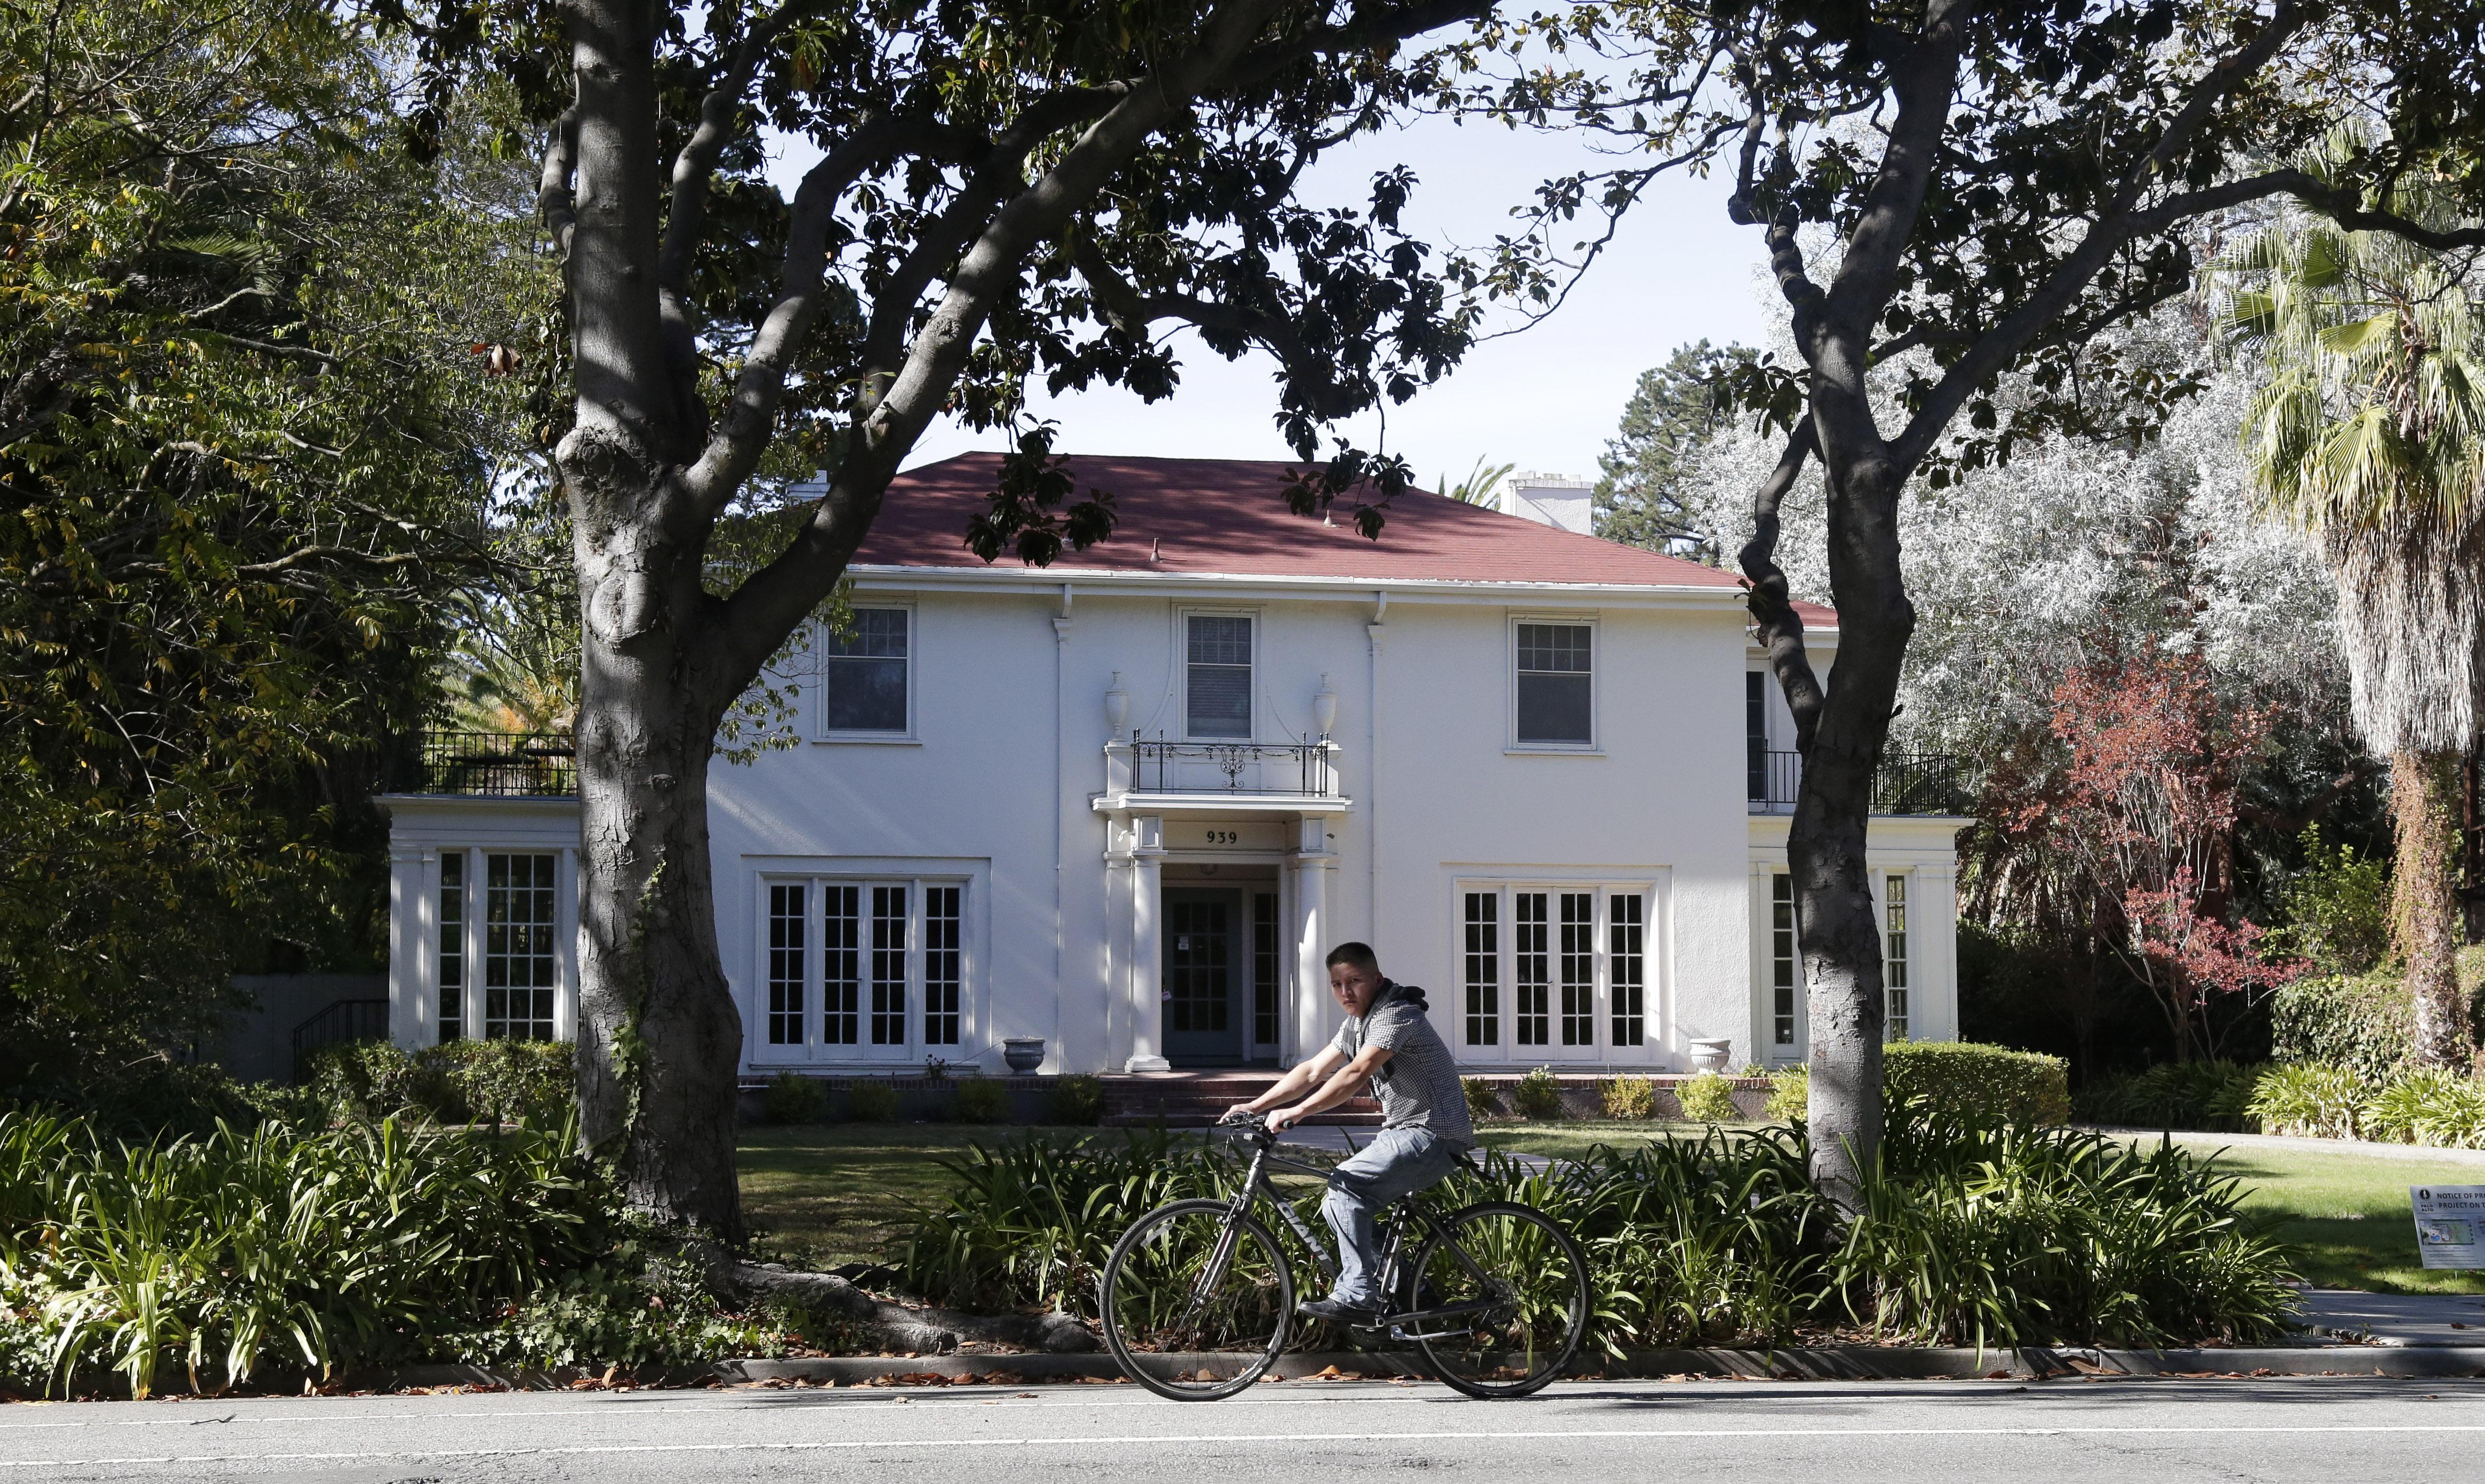 Opponents of transit density bill find an audience in Palo Alto